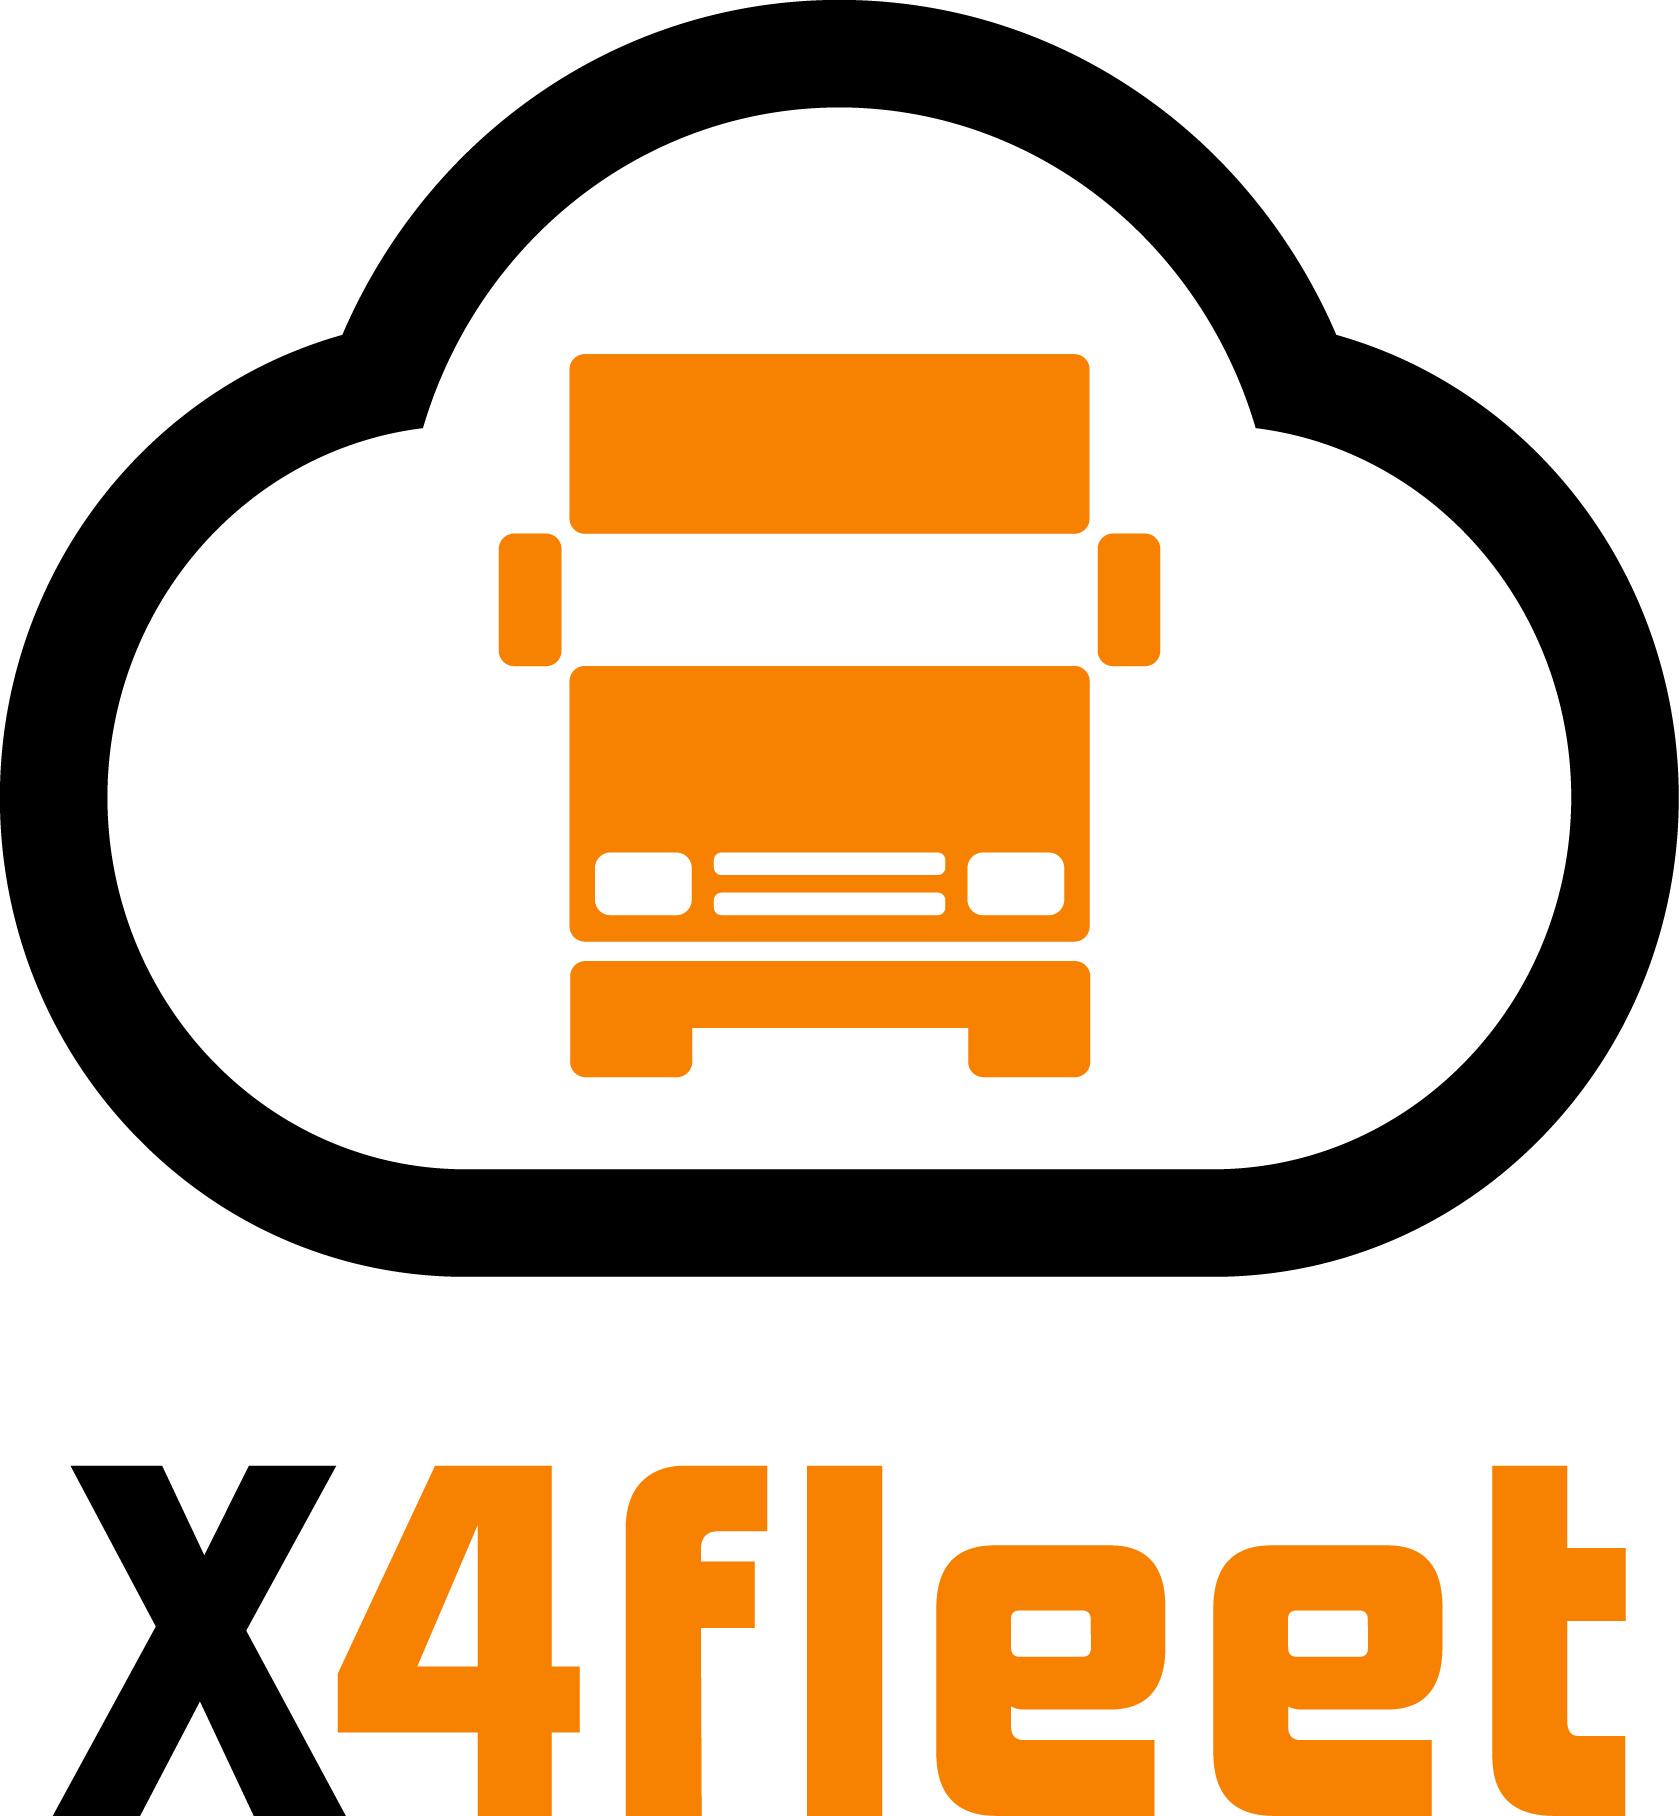 logo X4FLEET